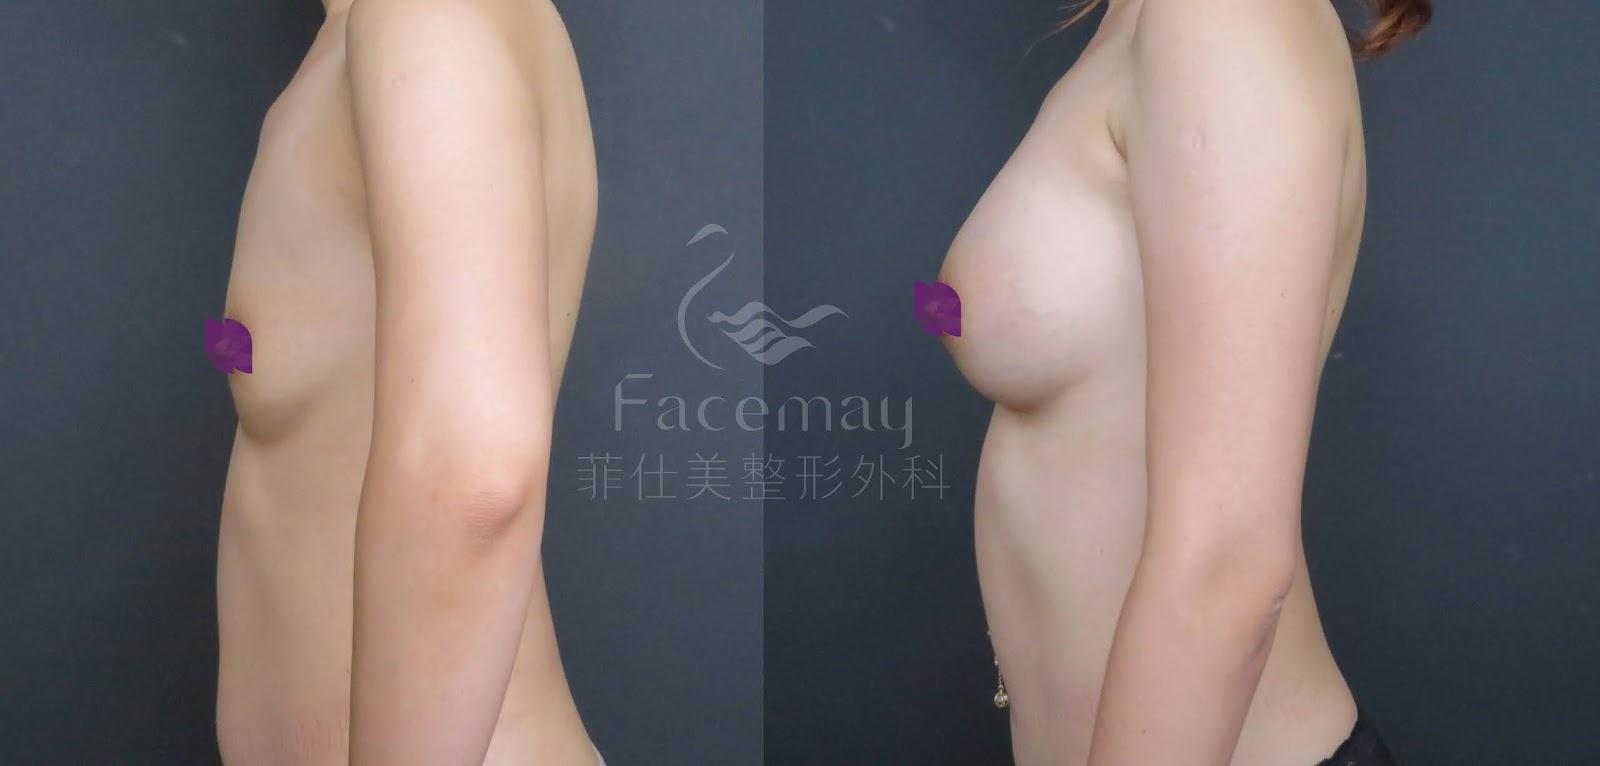 Motiva波力媚(俗稱魔滴)隆乳術前術後比較